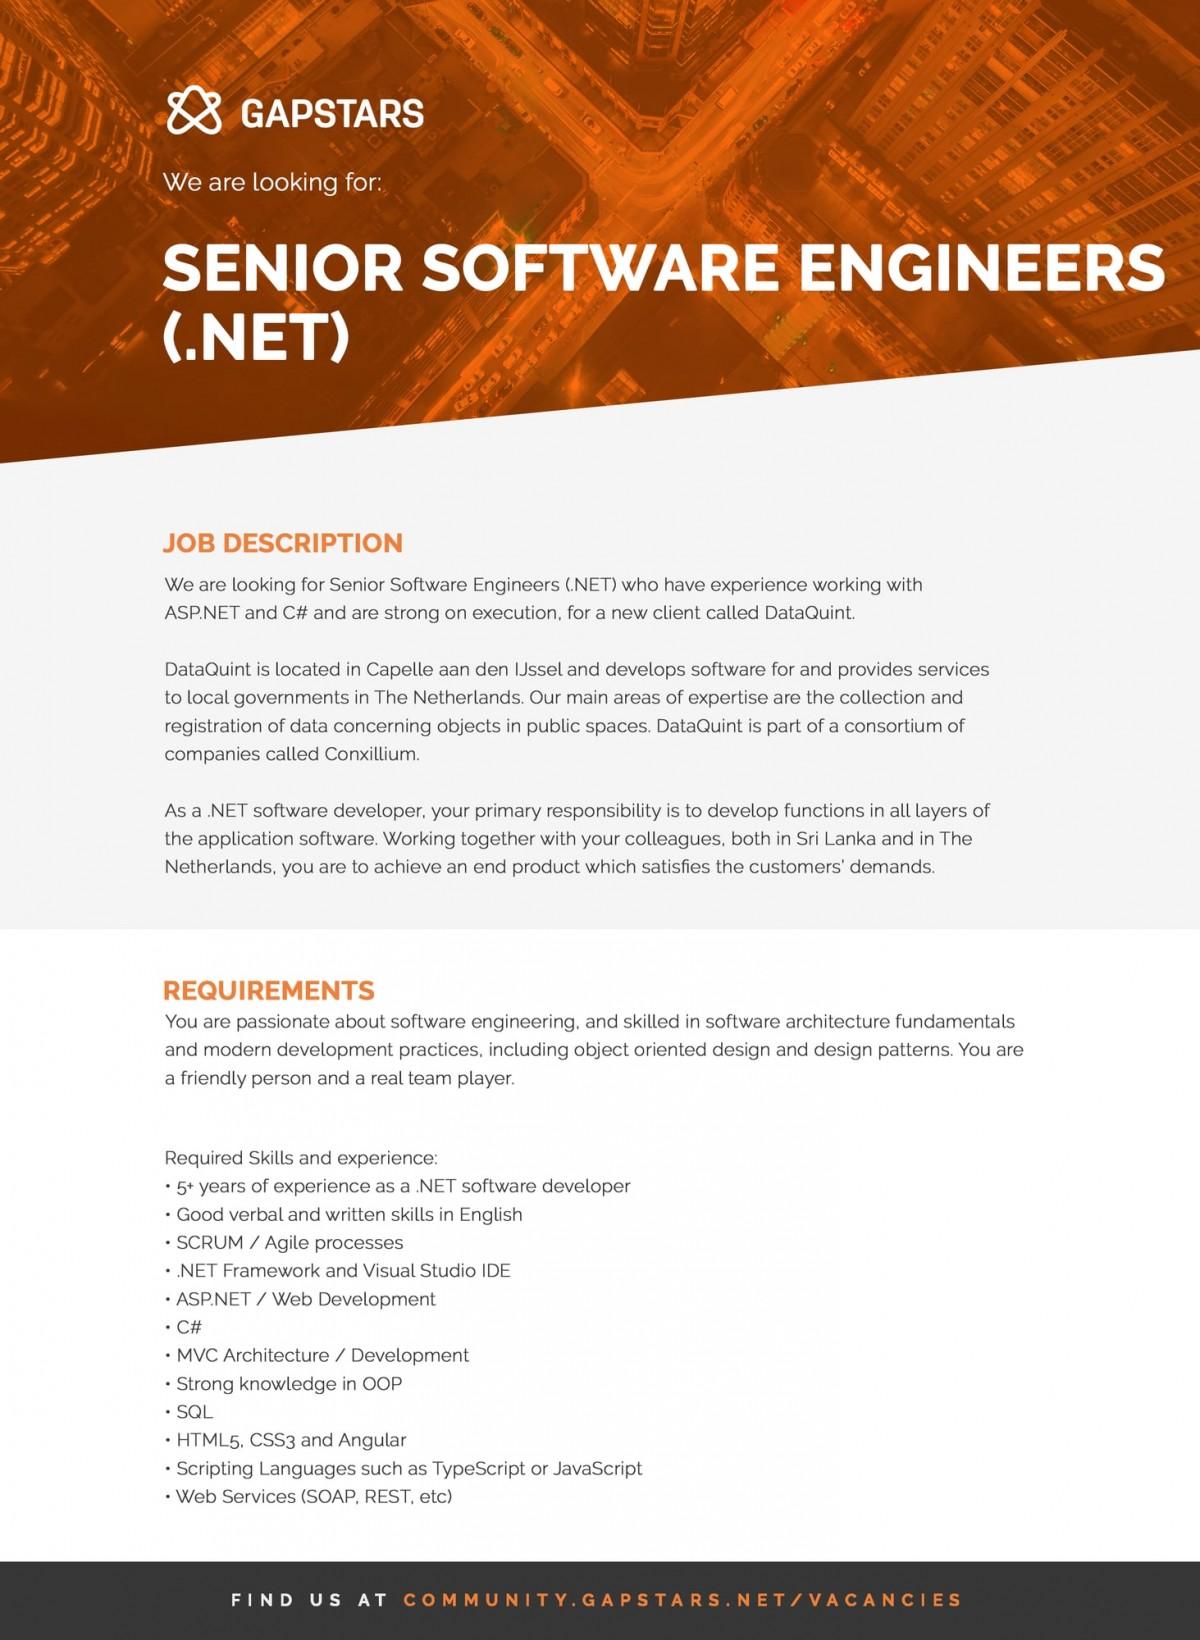 Senior Software Engineers (.Net) Job Vacancy in Sri Lanka